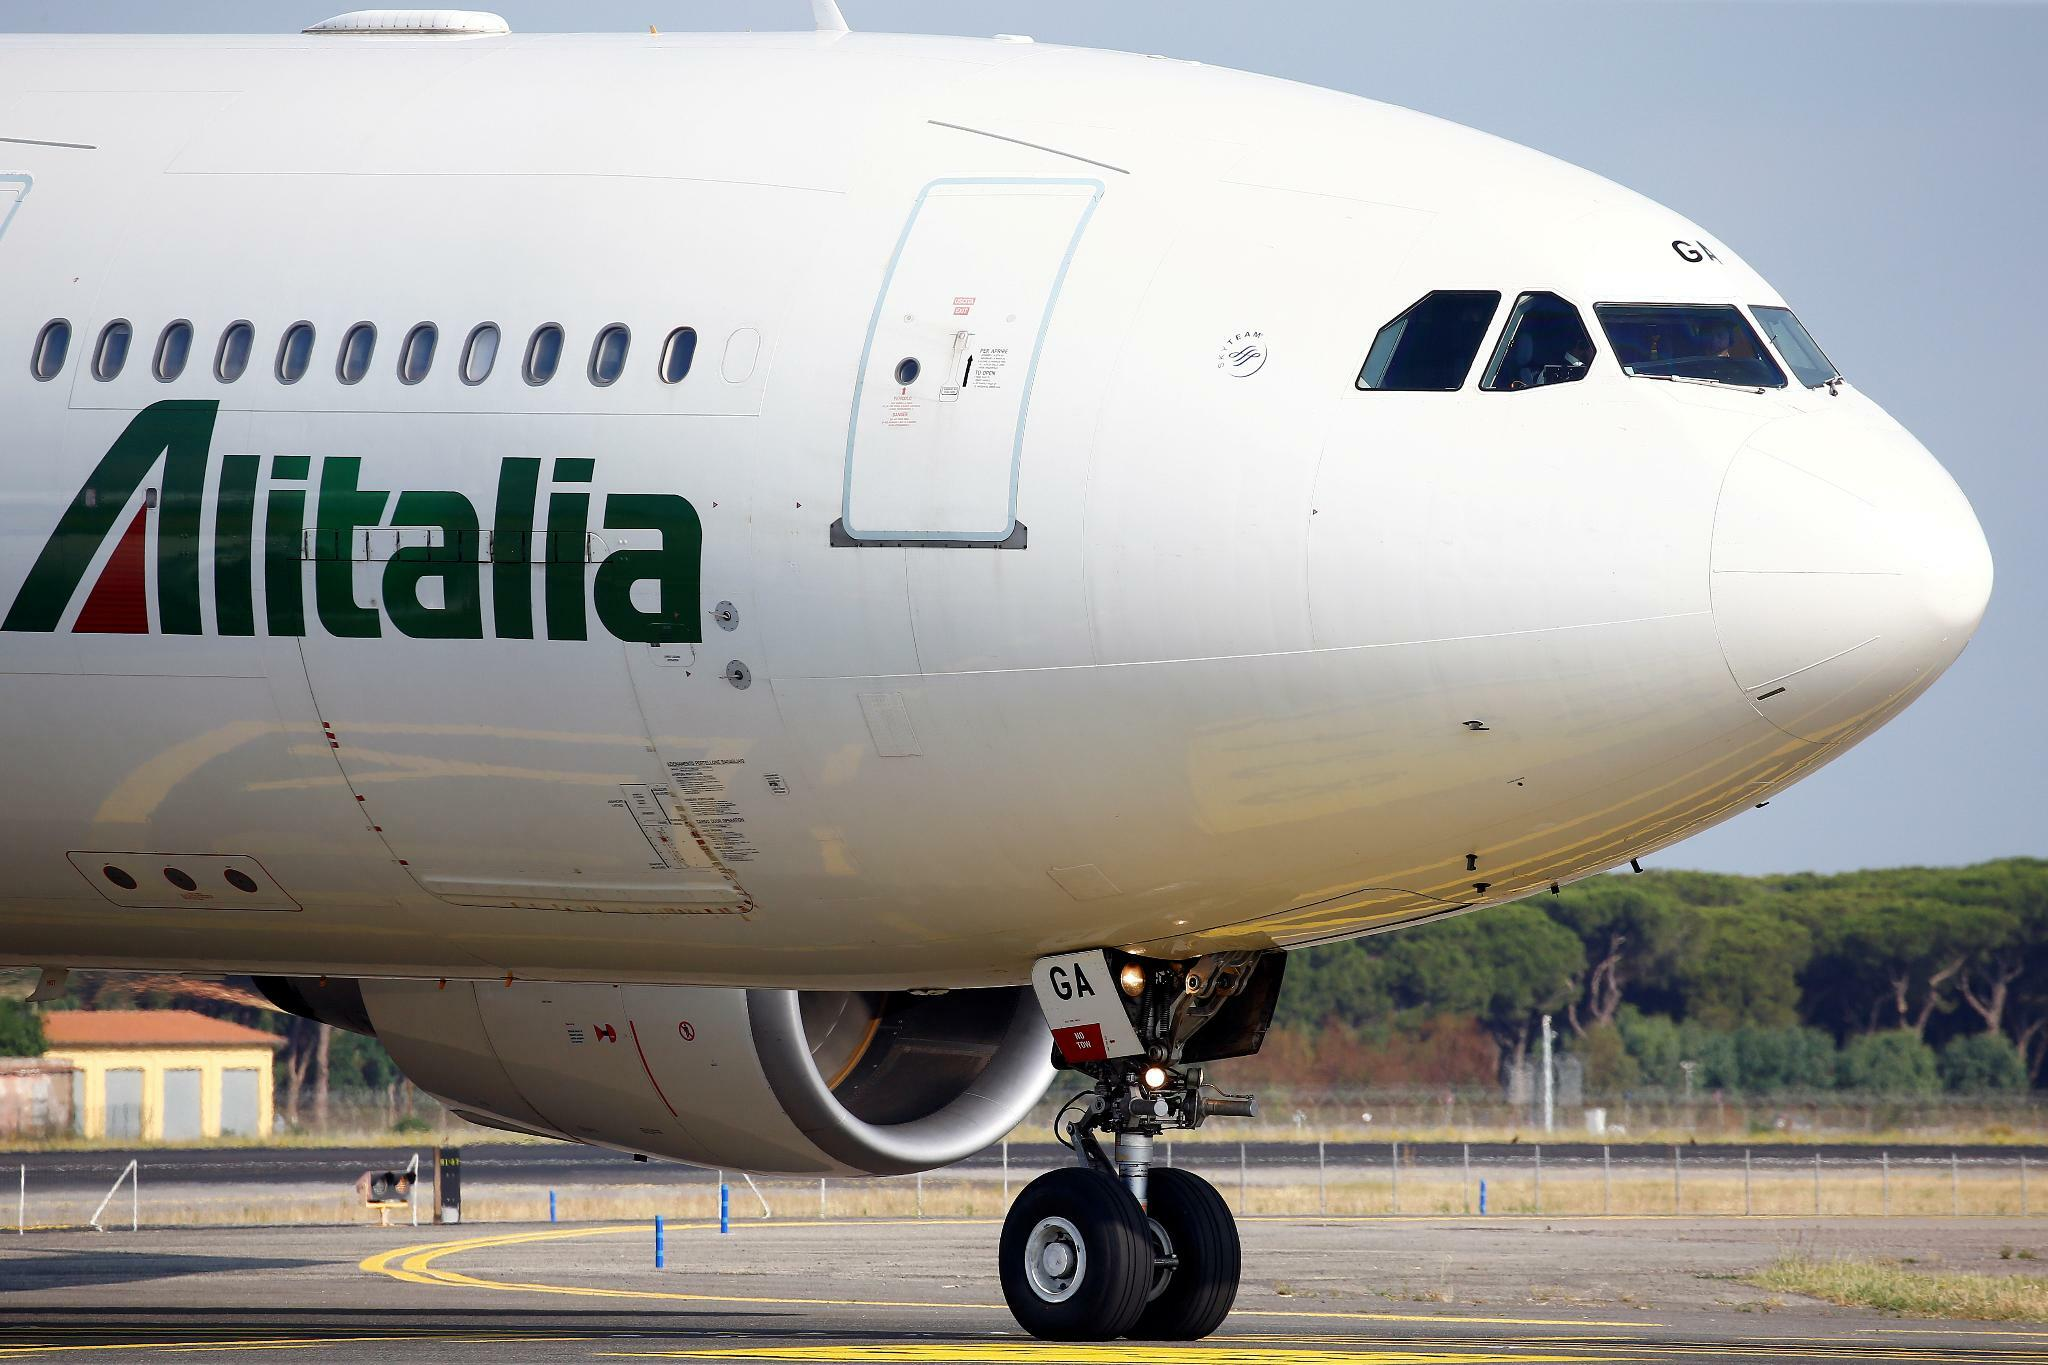 Atlantia erteilt Konsortium für Alitalia-Rettung Absage